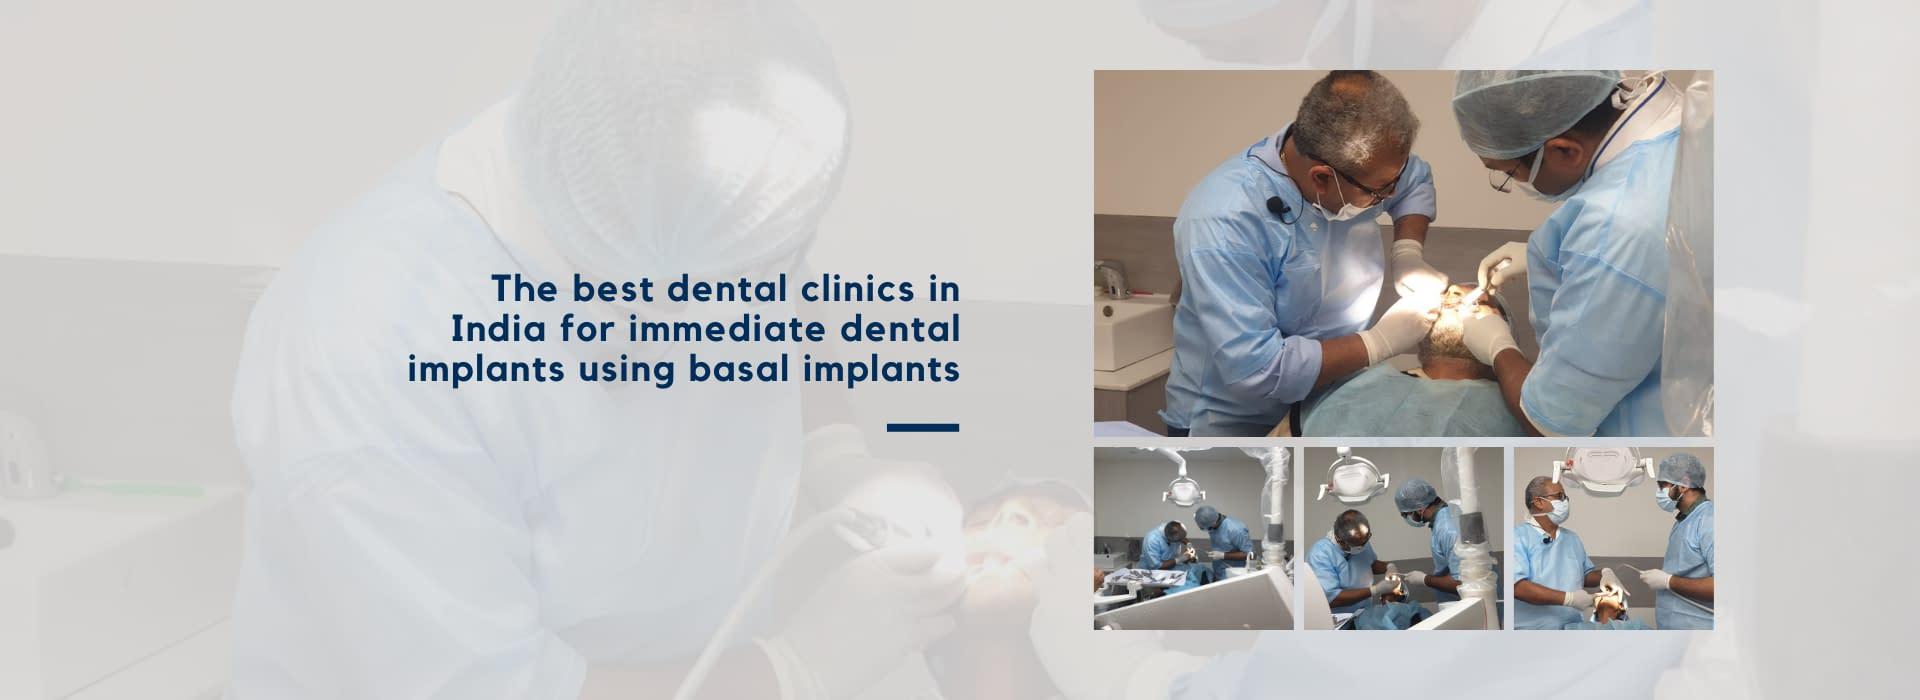 Dr Vivek Gaur - dental implants using basal implants